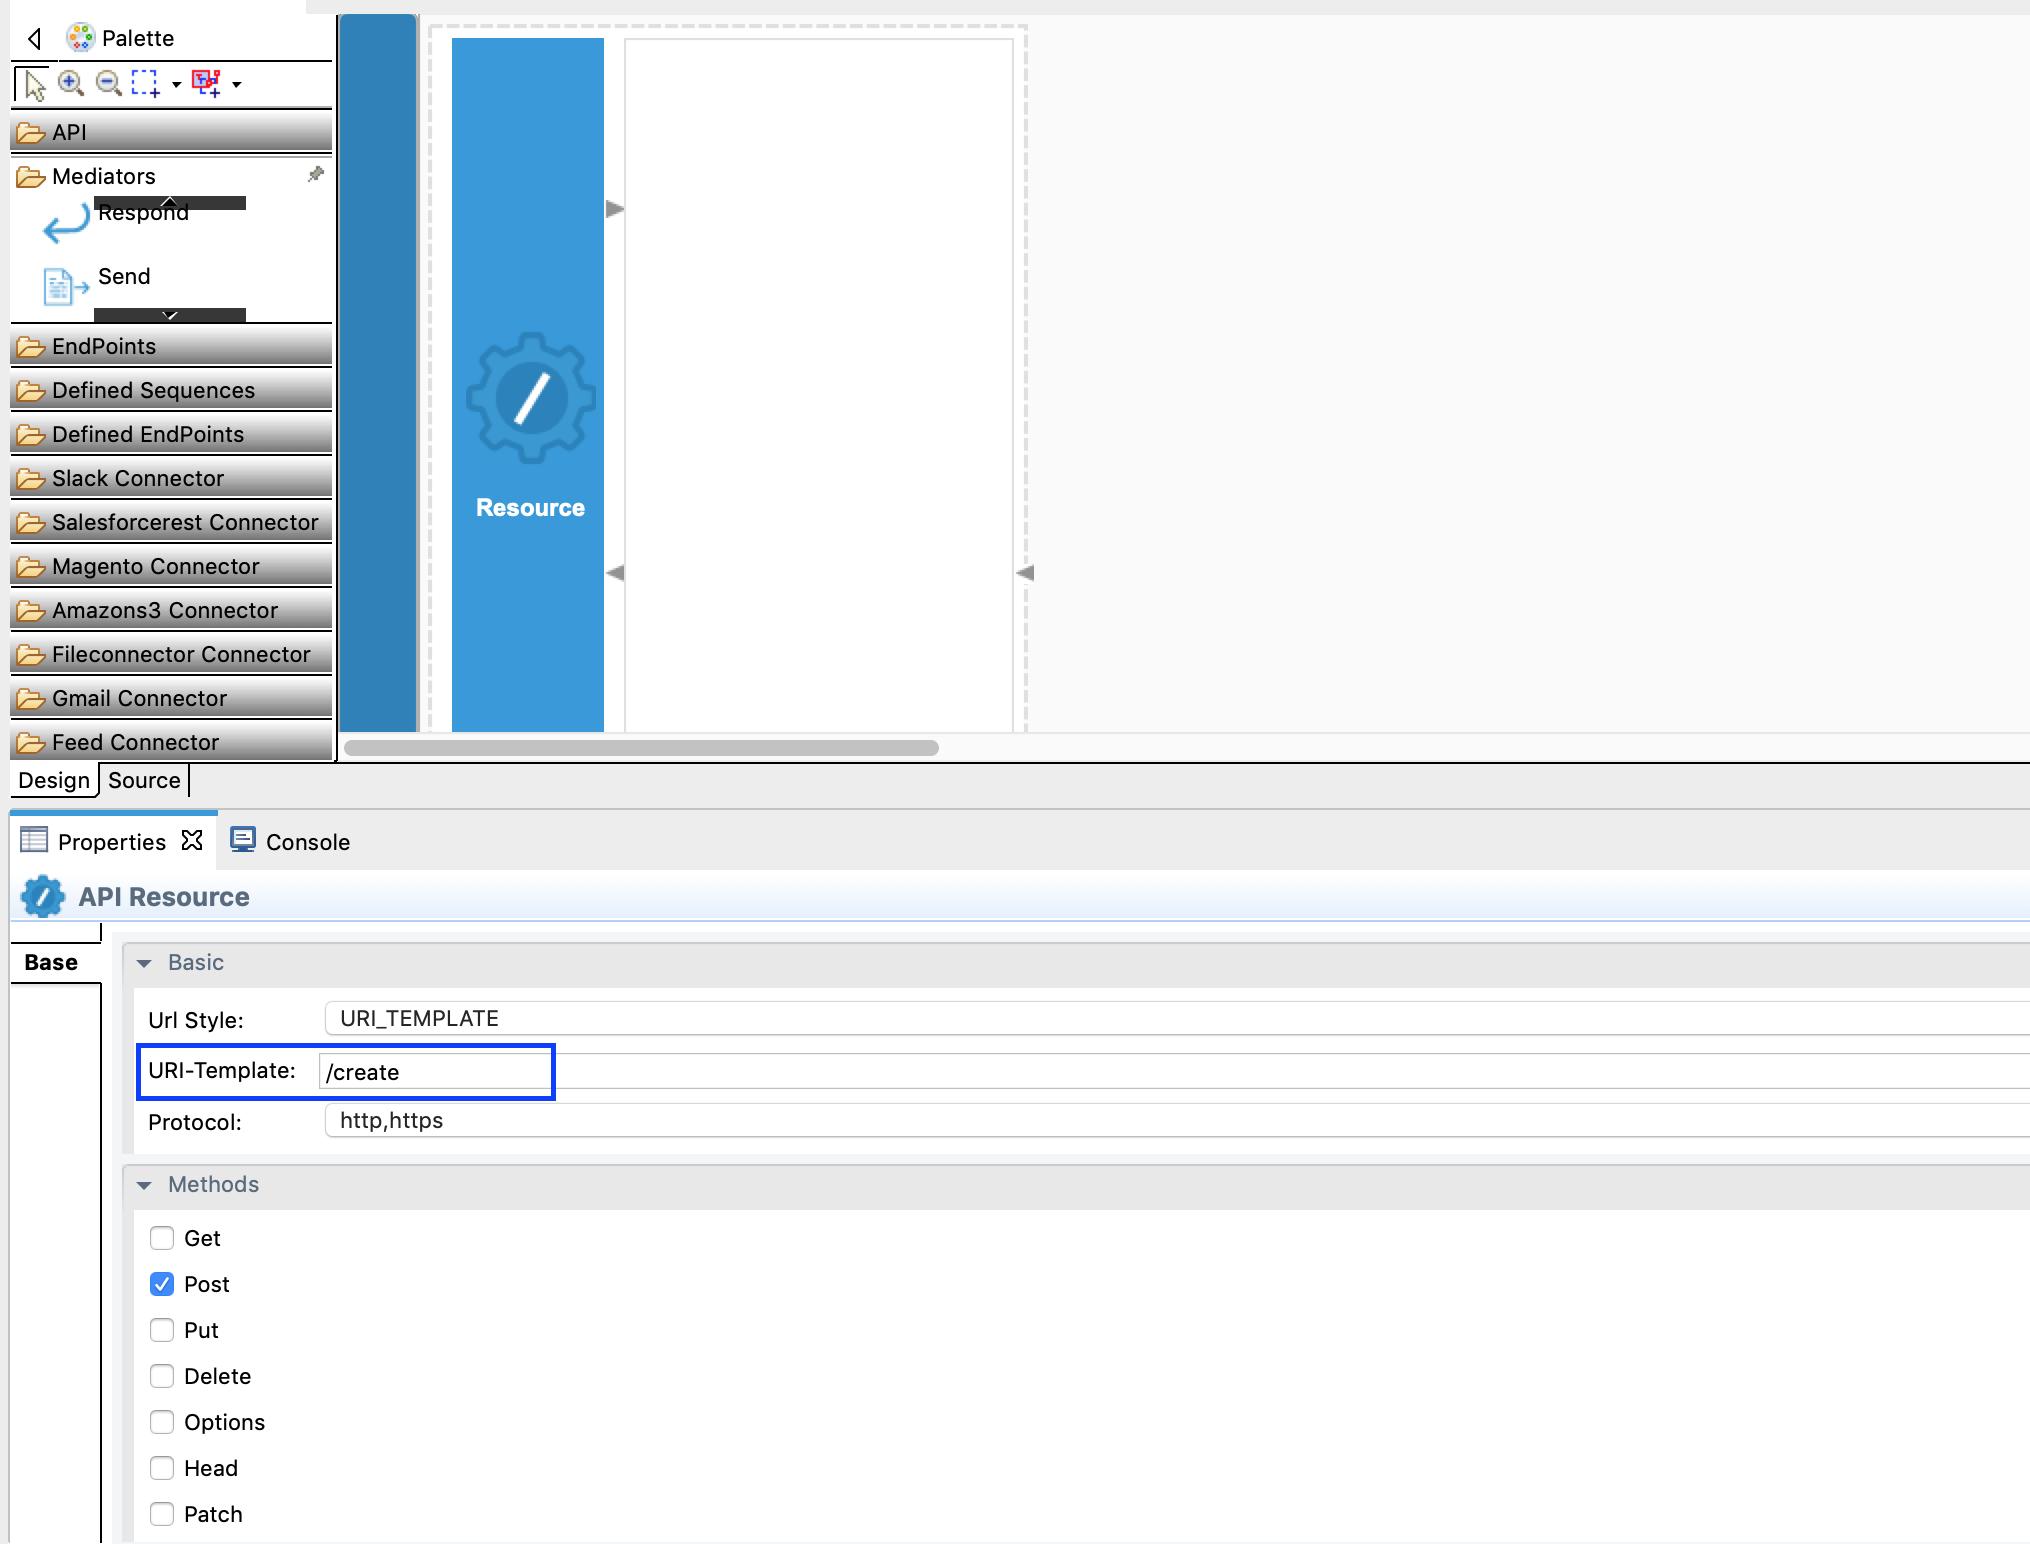 Adding the API resource.